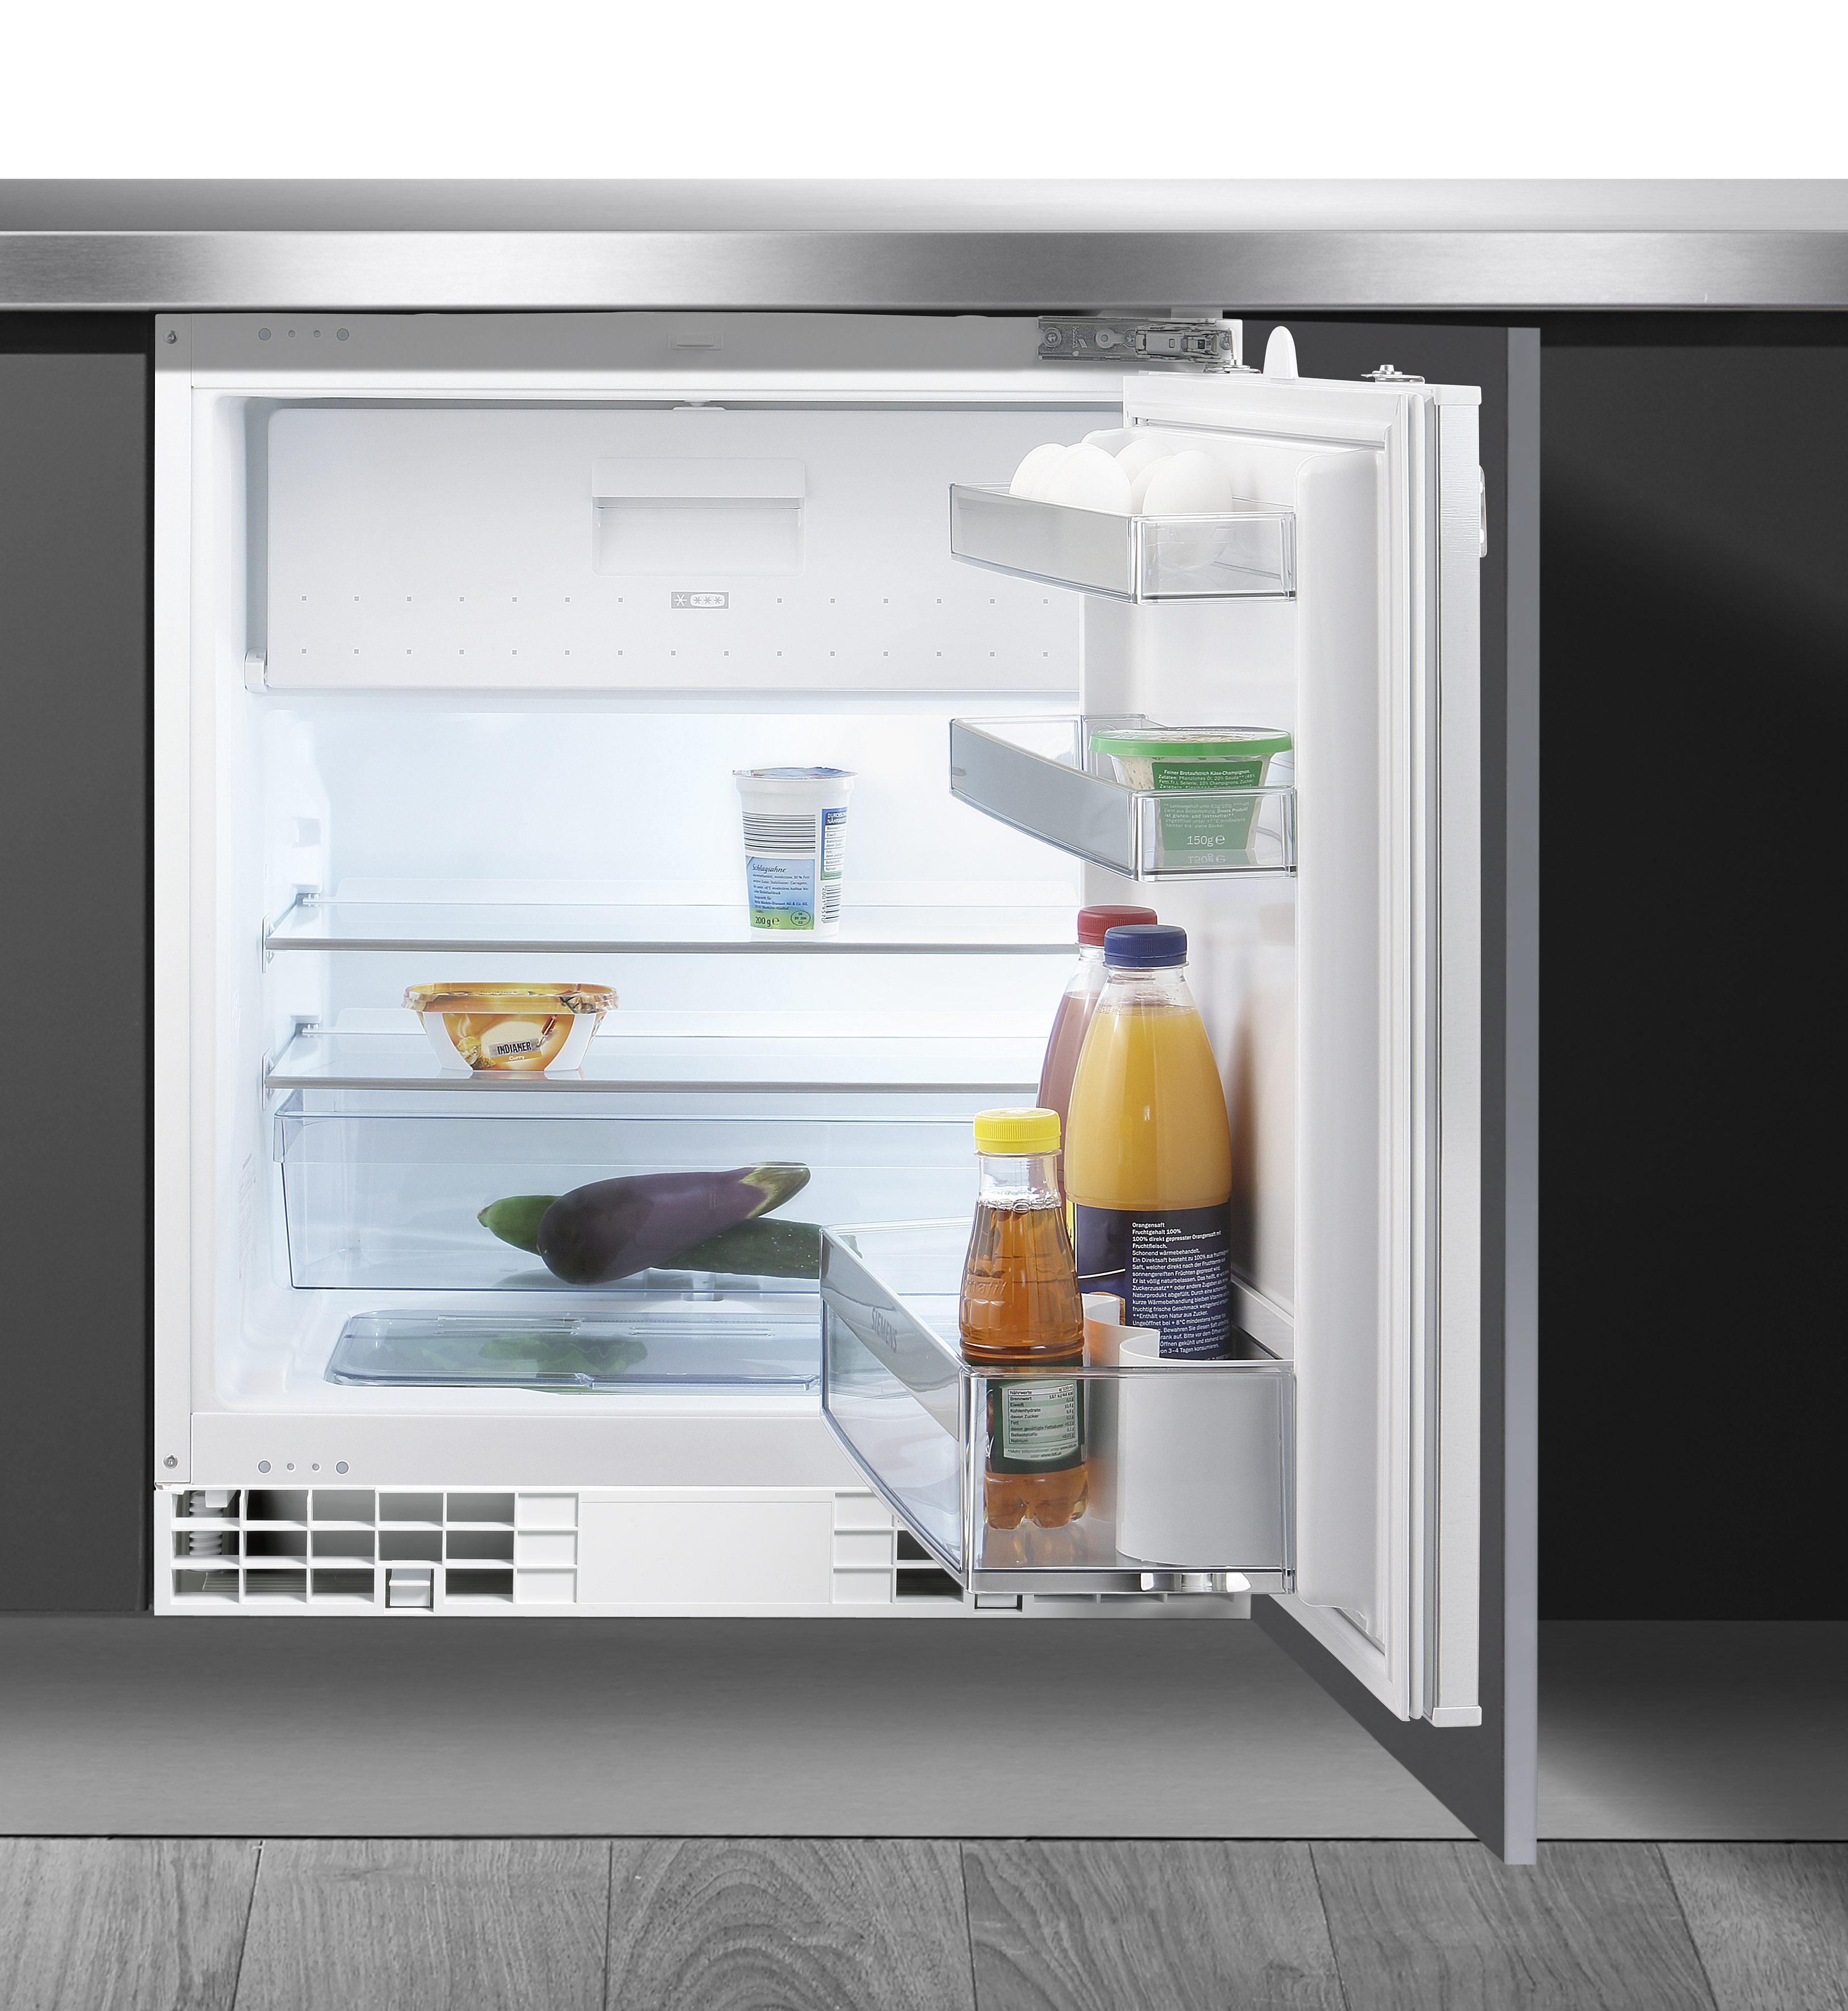 SIEMENS Einbaukühlschrank KU15LA60, 82,0 cm hoch, 59,8 cm breit, A++, 82 cm, integrierbar